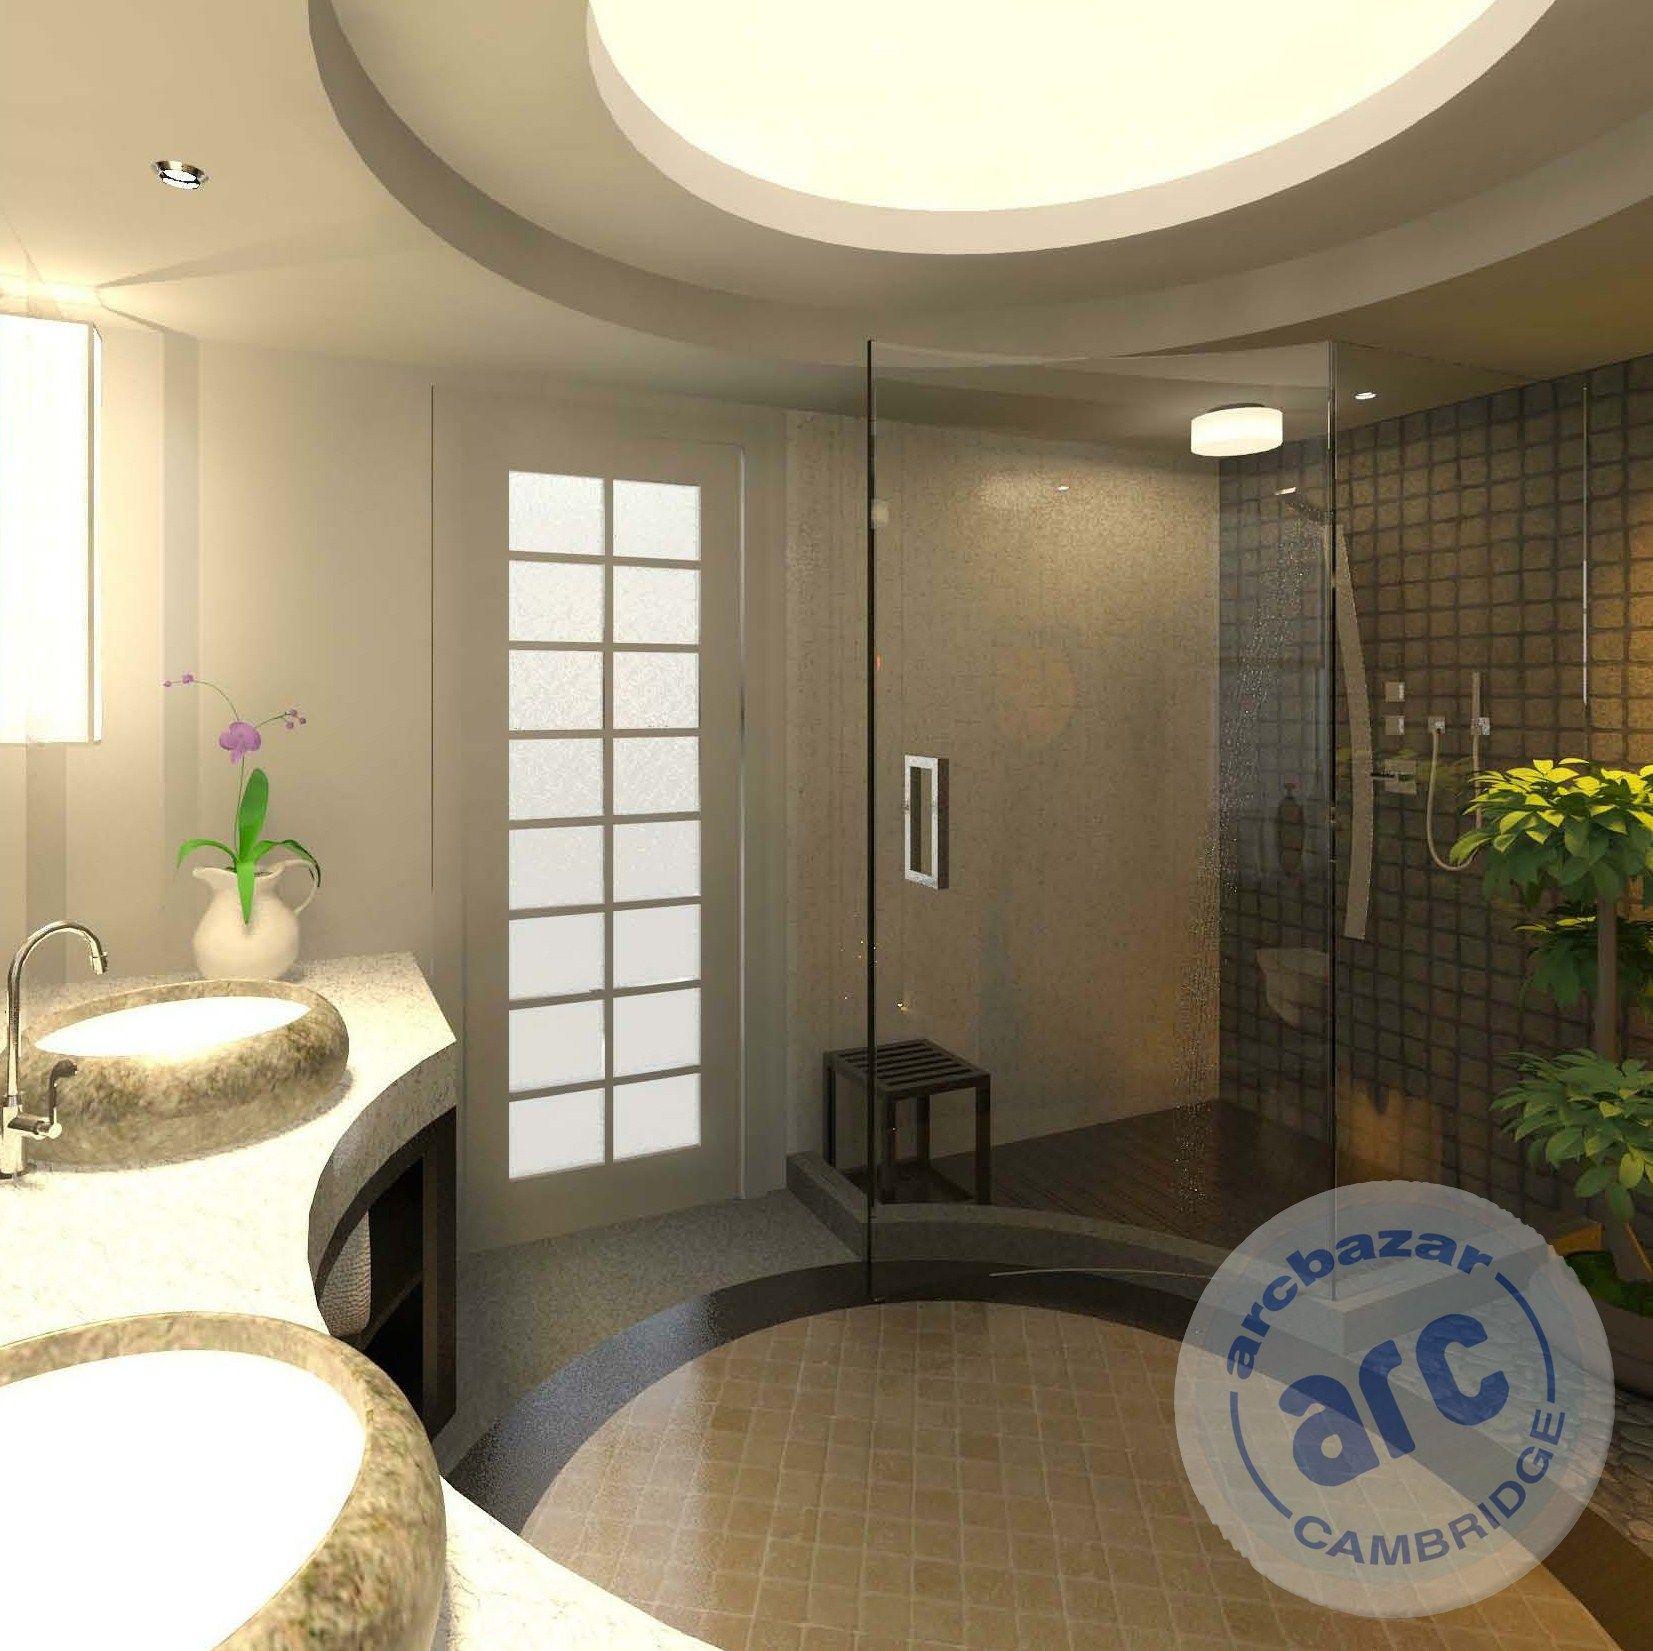 Bathroom Remodeling Fort Lauderdale - Bathroom Design